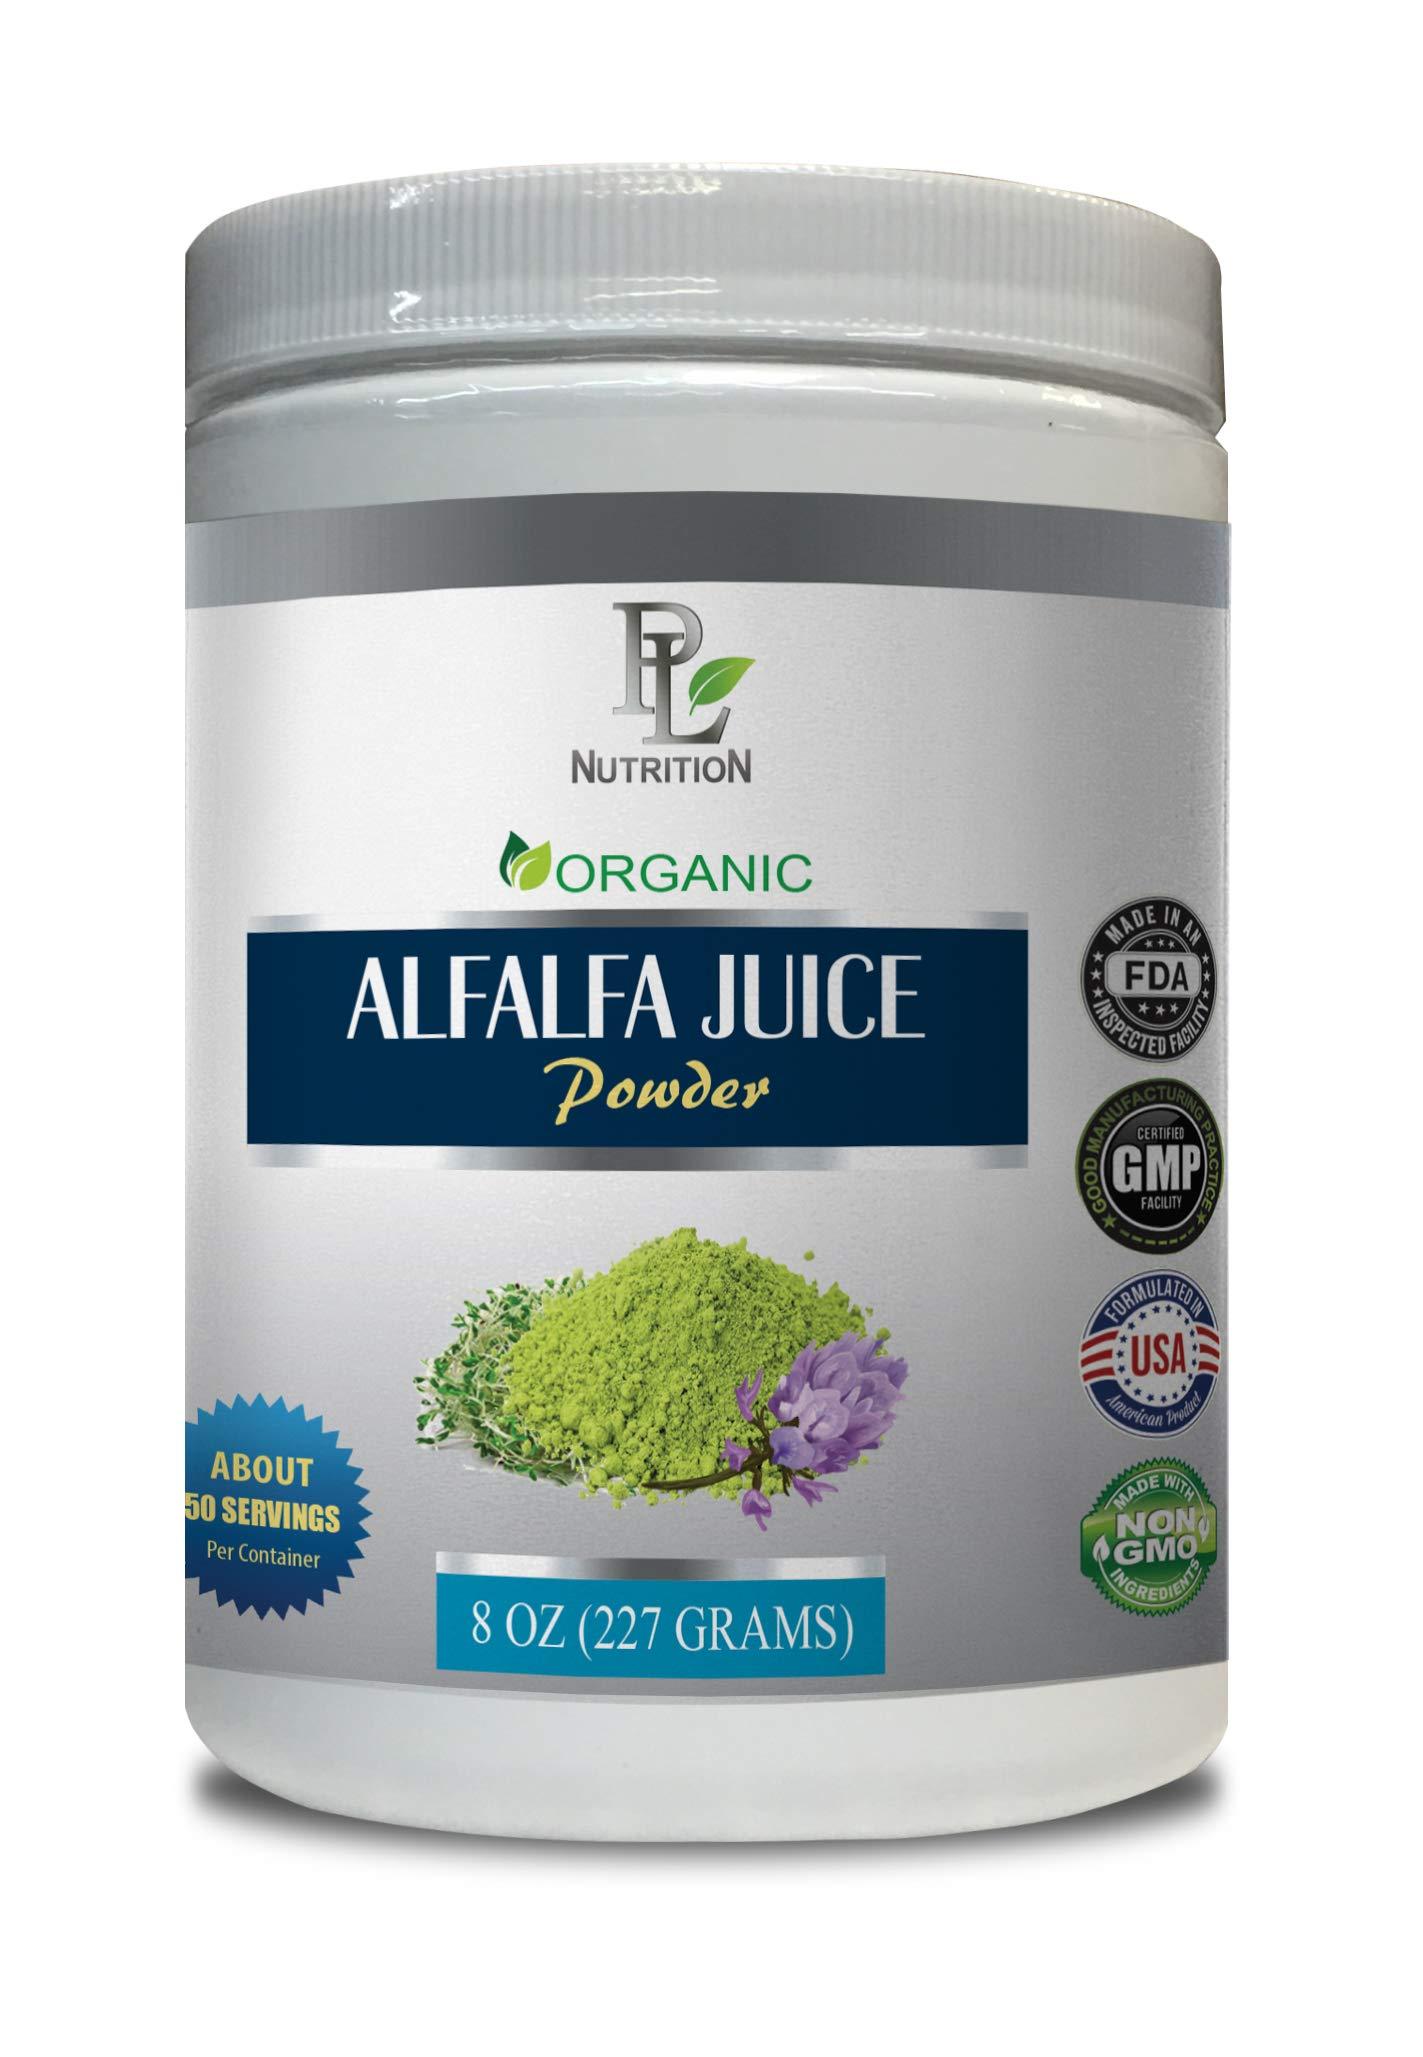 antioxidant Amazing Grass - Alfalfa Organic - Juice Powder - Alfalfa Juice Powder Organic - 1 Can 8 OZ (50 Servings)